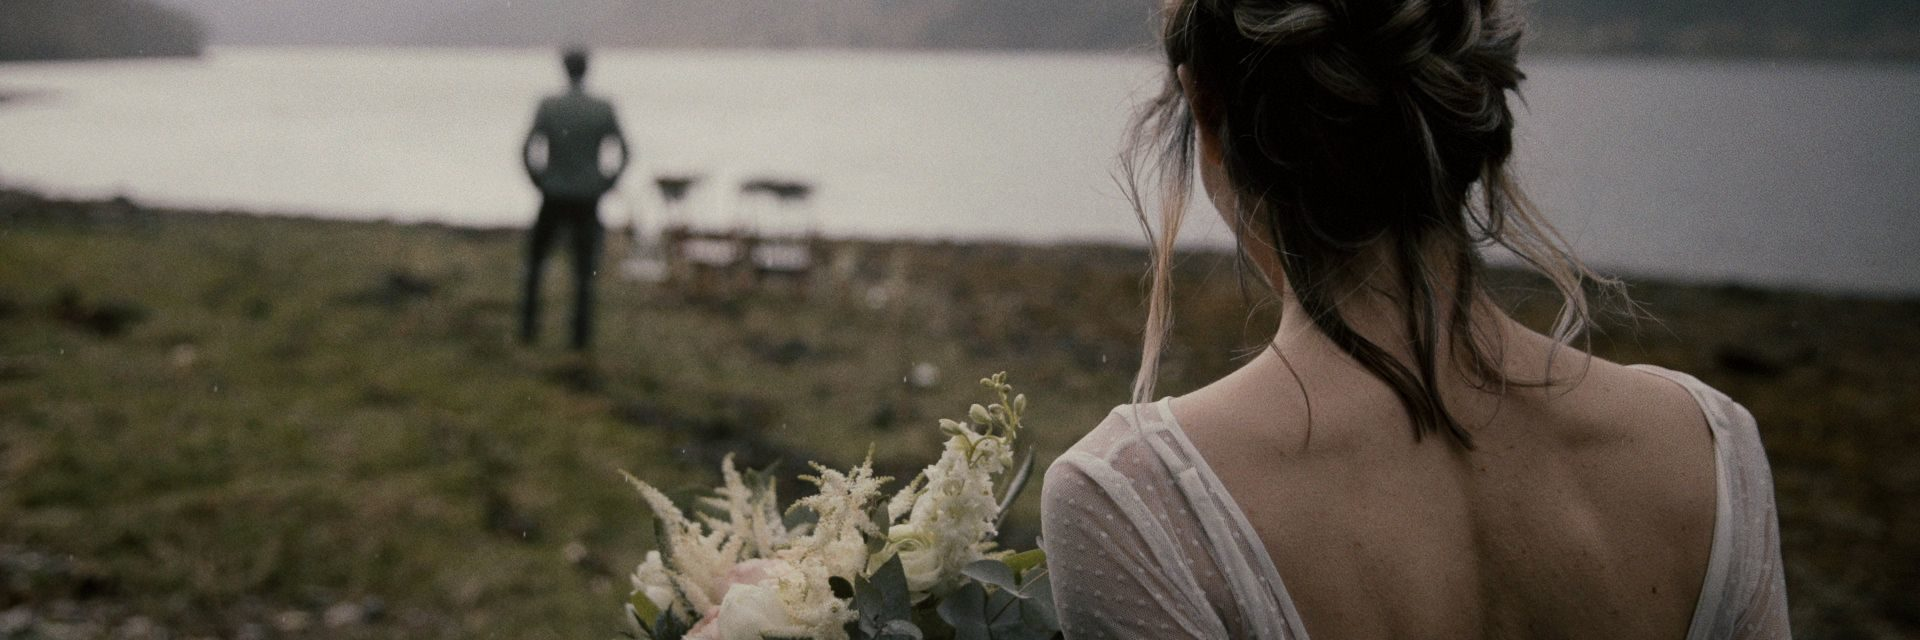 Skogafoss-wedding-videographer-cinemate-films-02